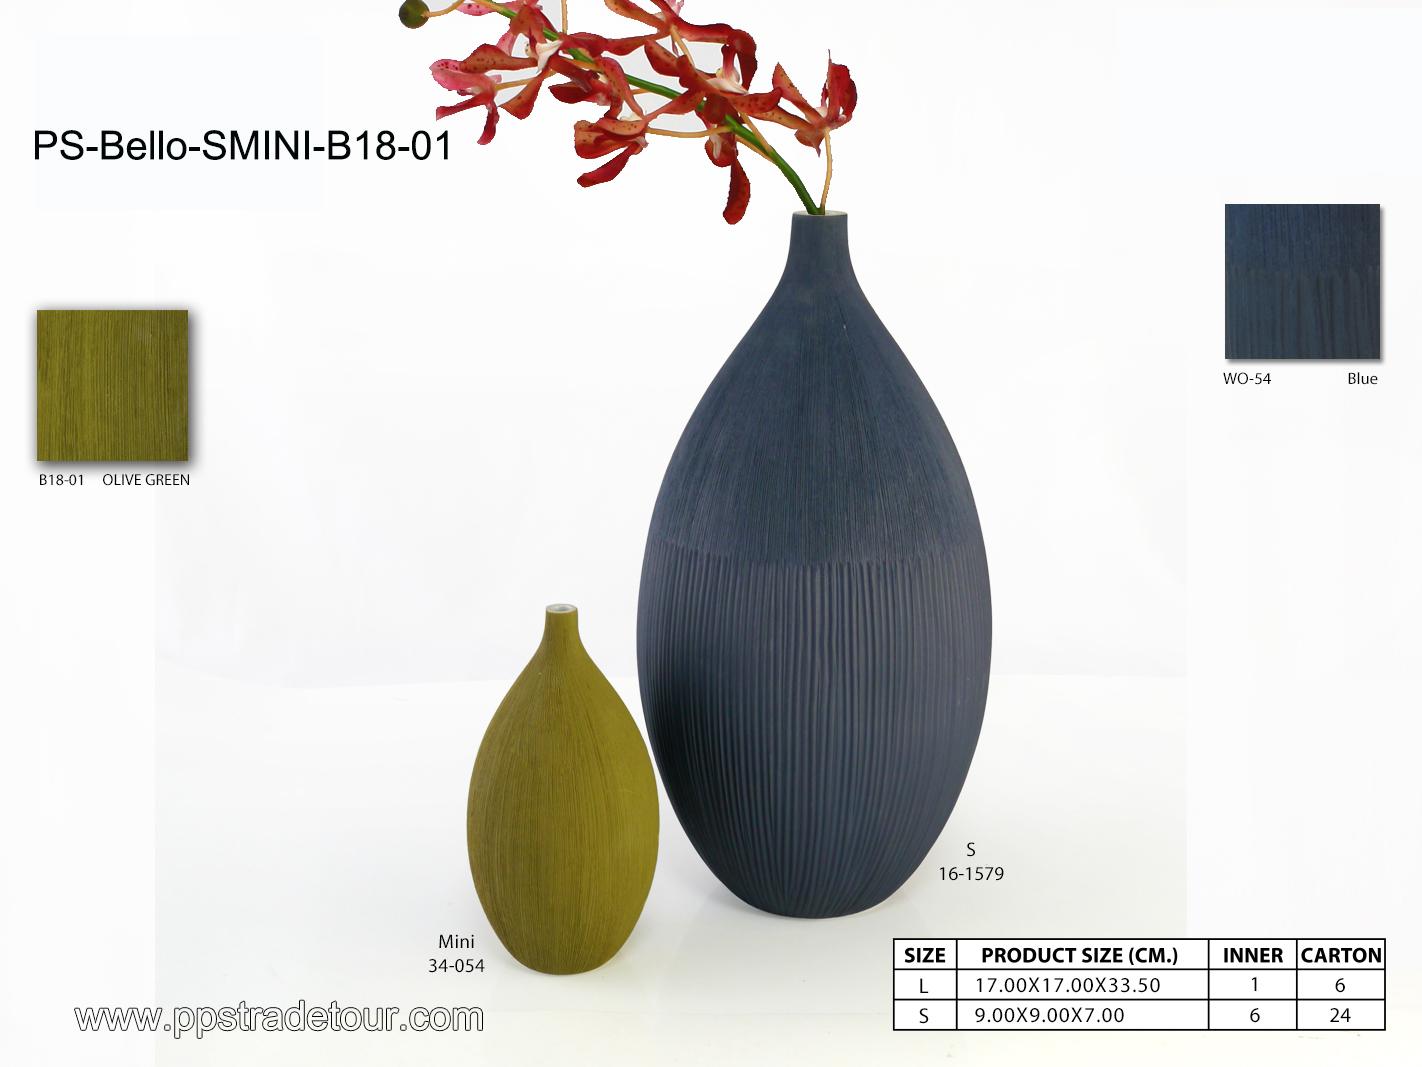 PSCV-Bello-SMINI-B18-01-OLIVE-GREENWO-54